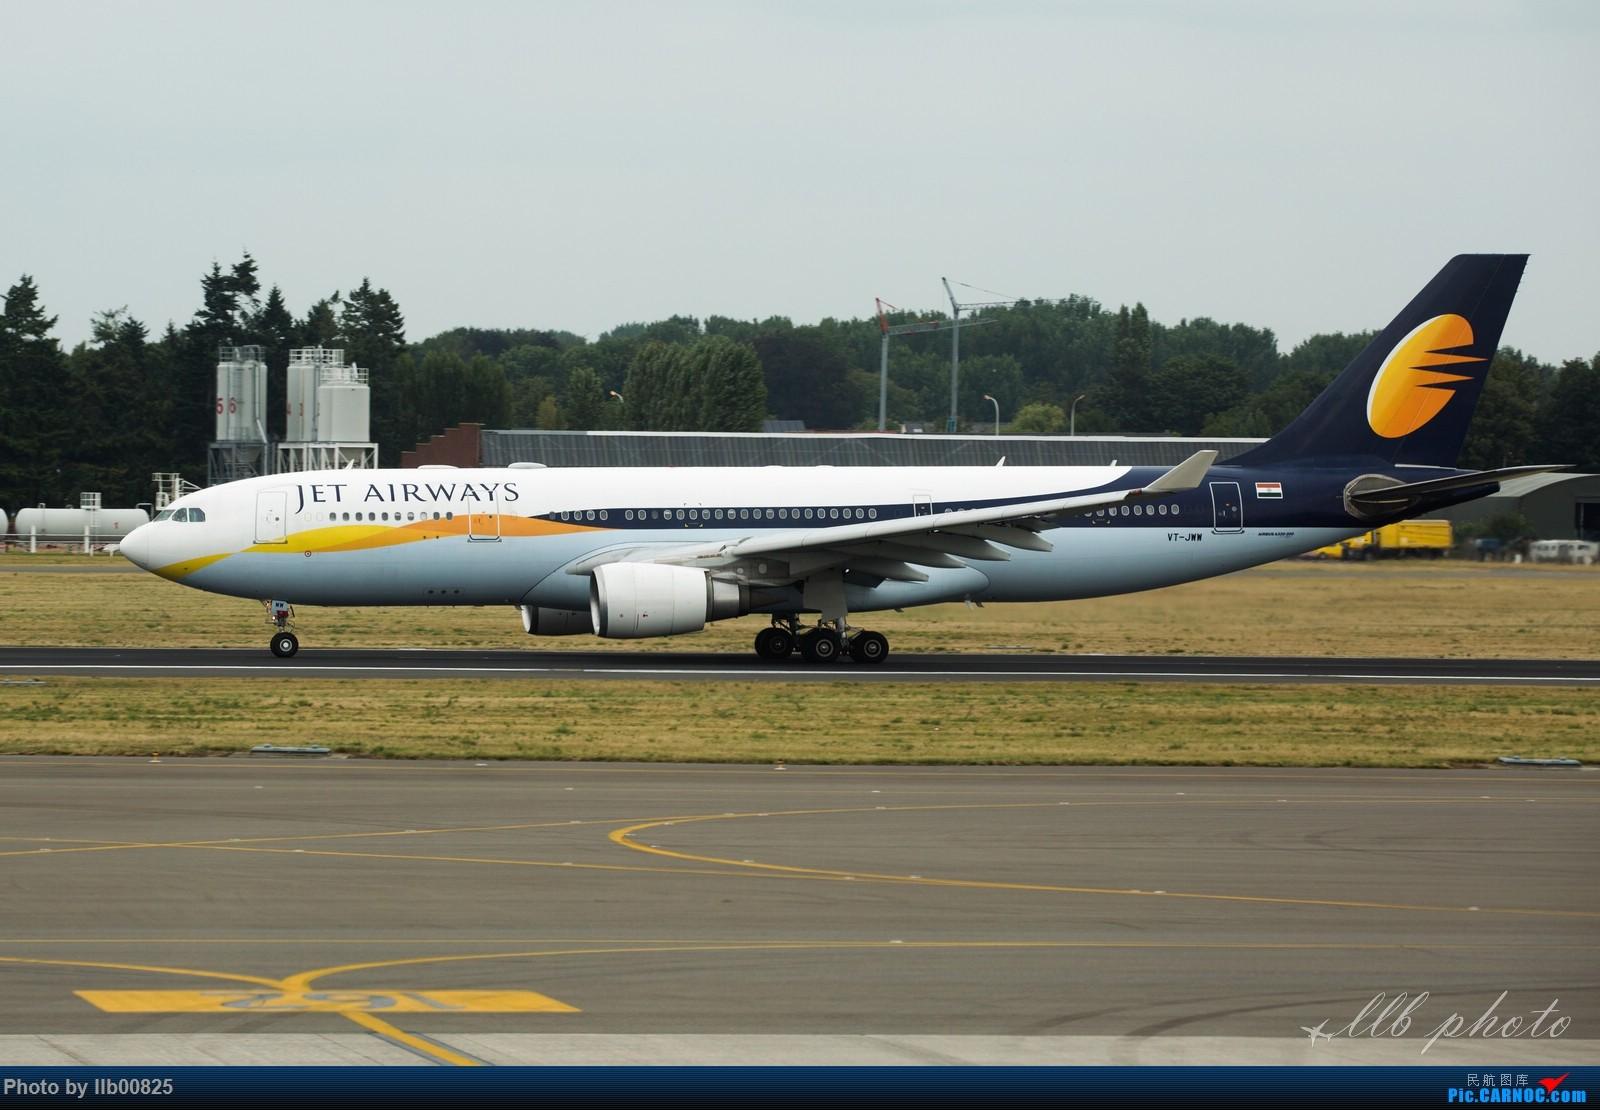 Re:[原创]赫尔辛基-布鲁塞尔一些杂图 AIRBUS A330-200 VT-JWW 比利时布鲁塞尔机场